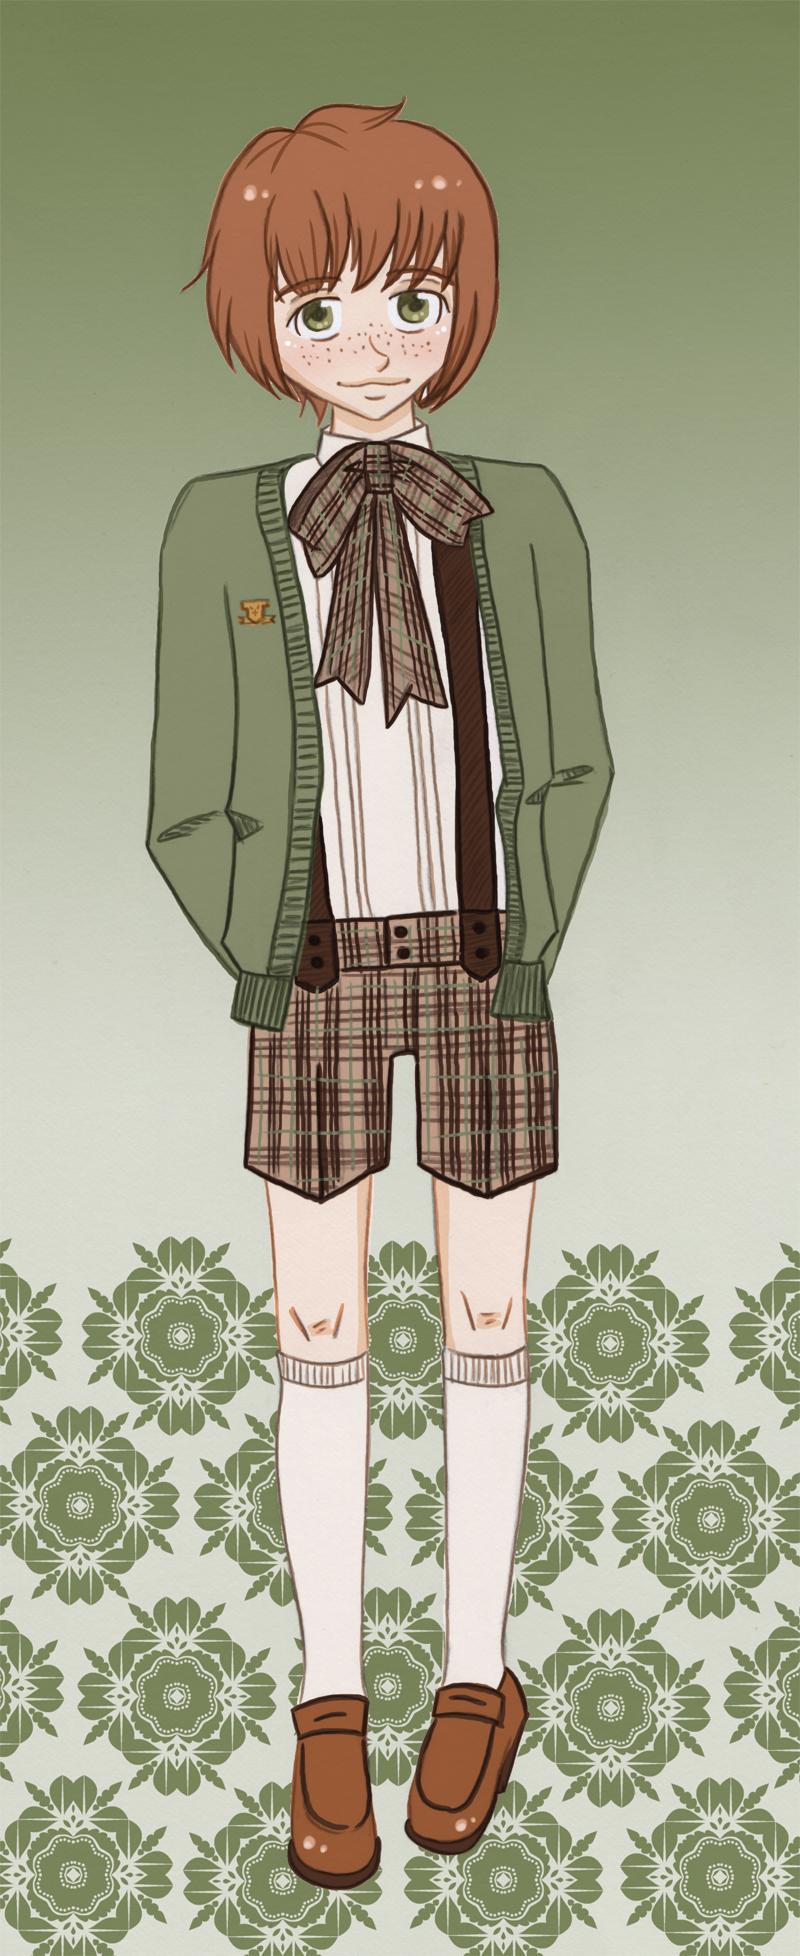 Aidan - Uniform